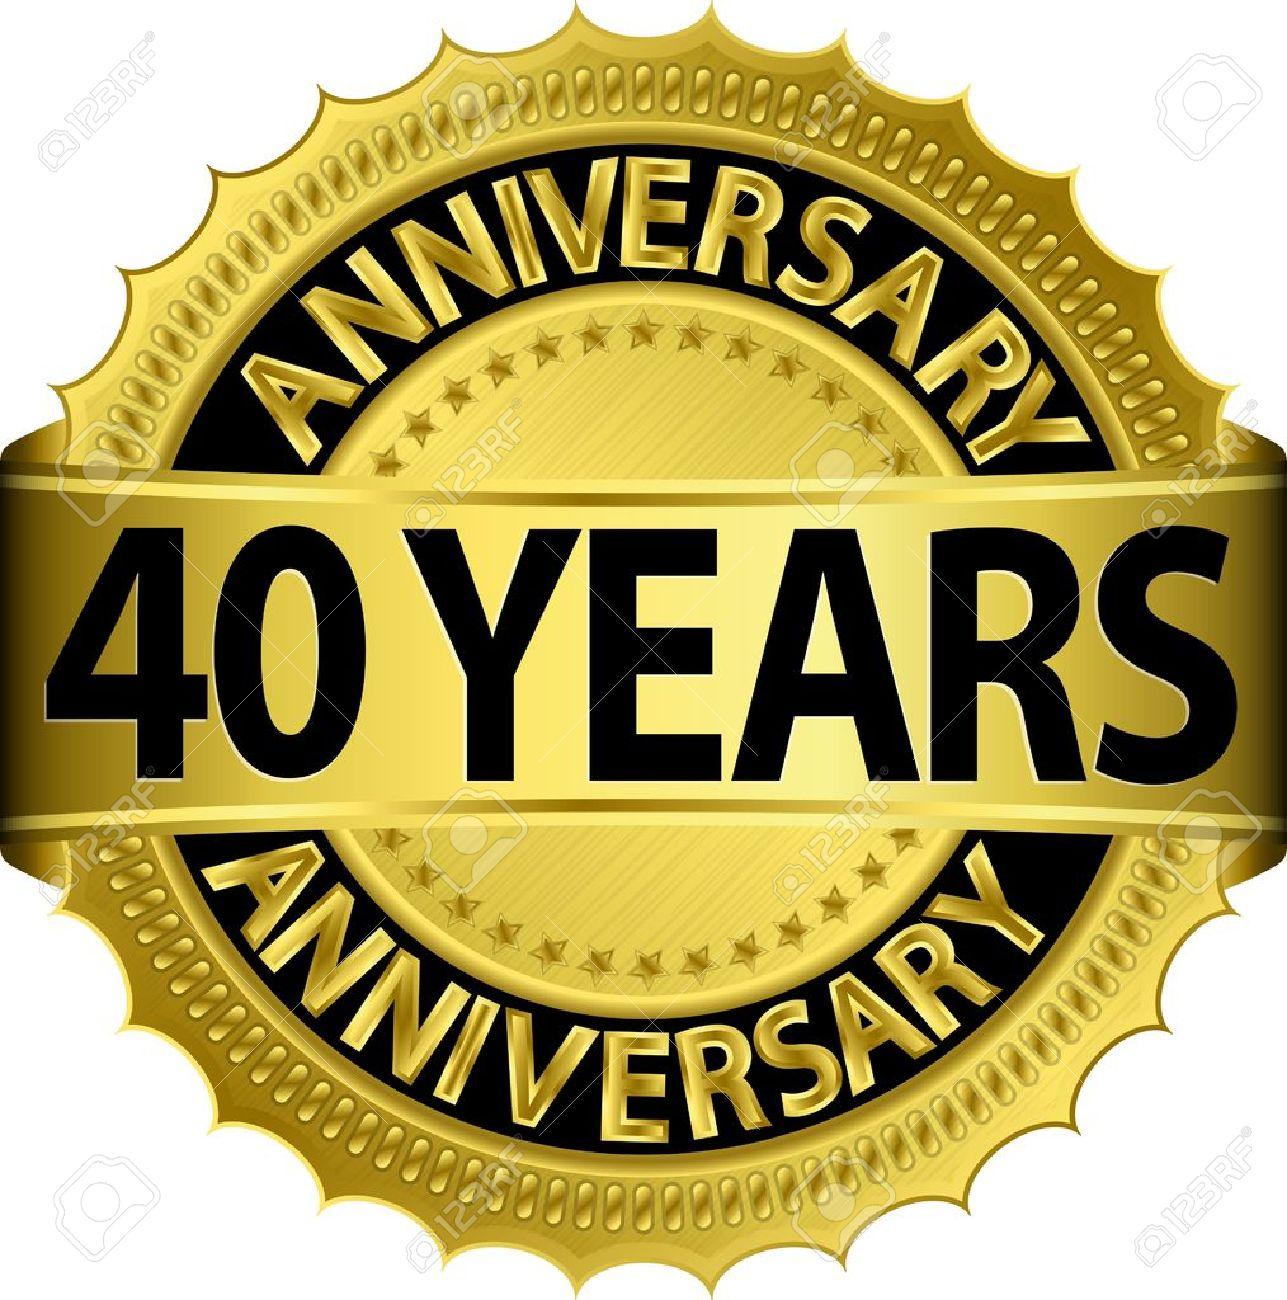 40 Jahre Jubilaum Goldenen Etikett Mit Band Vektor Illustration